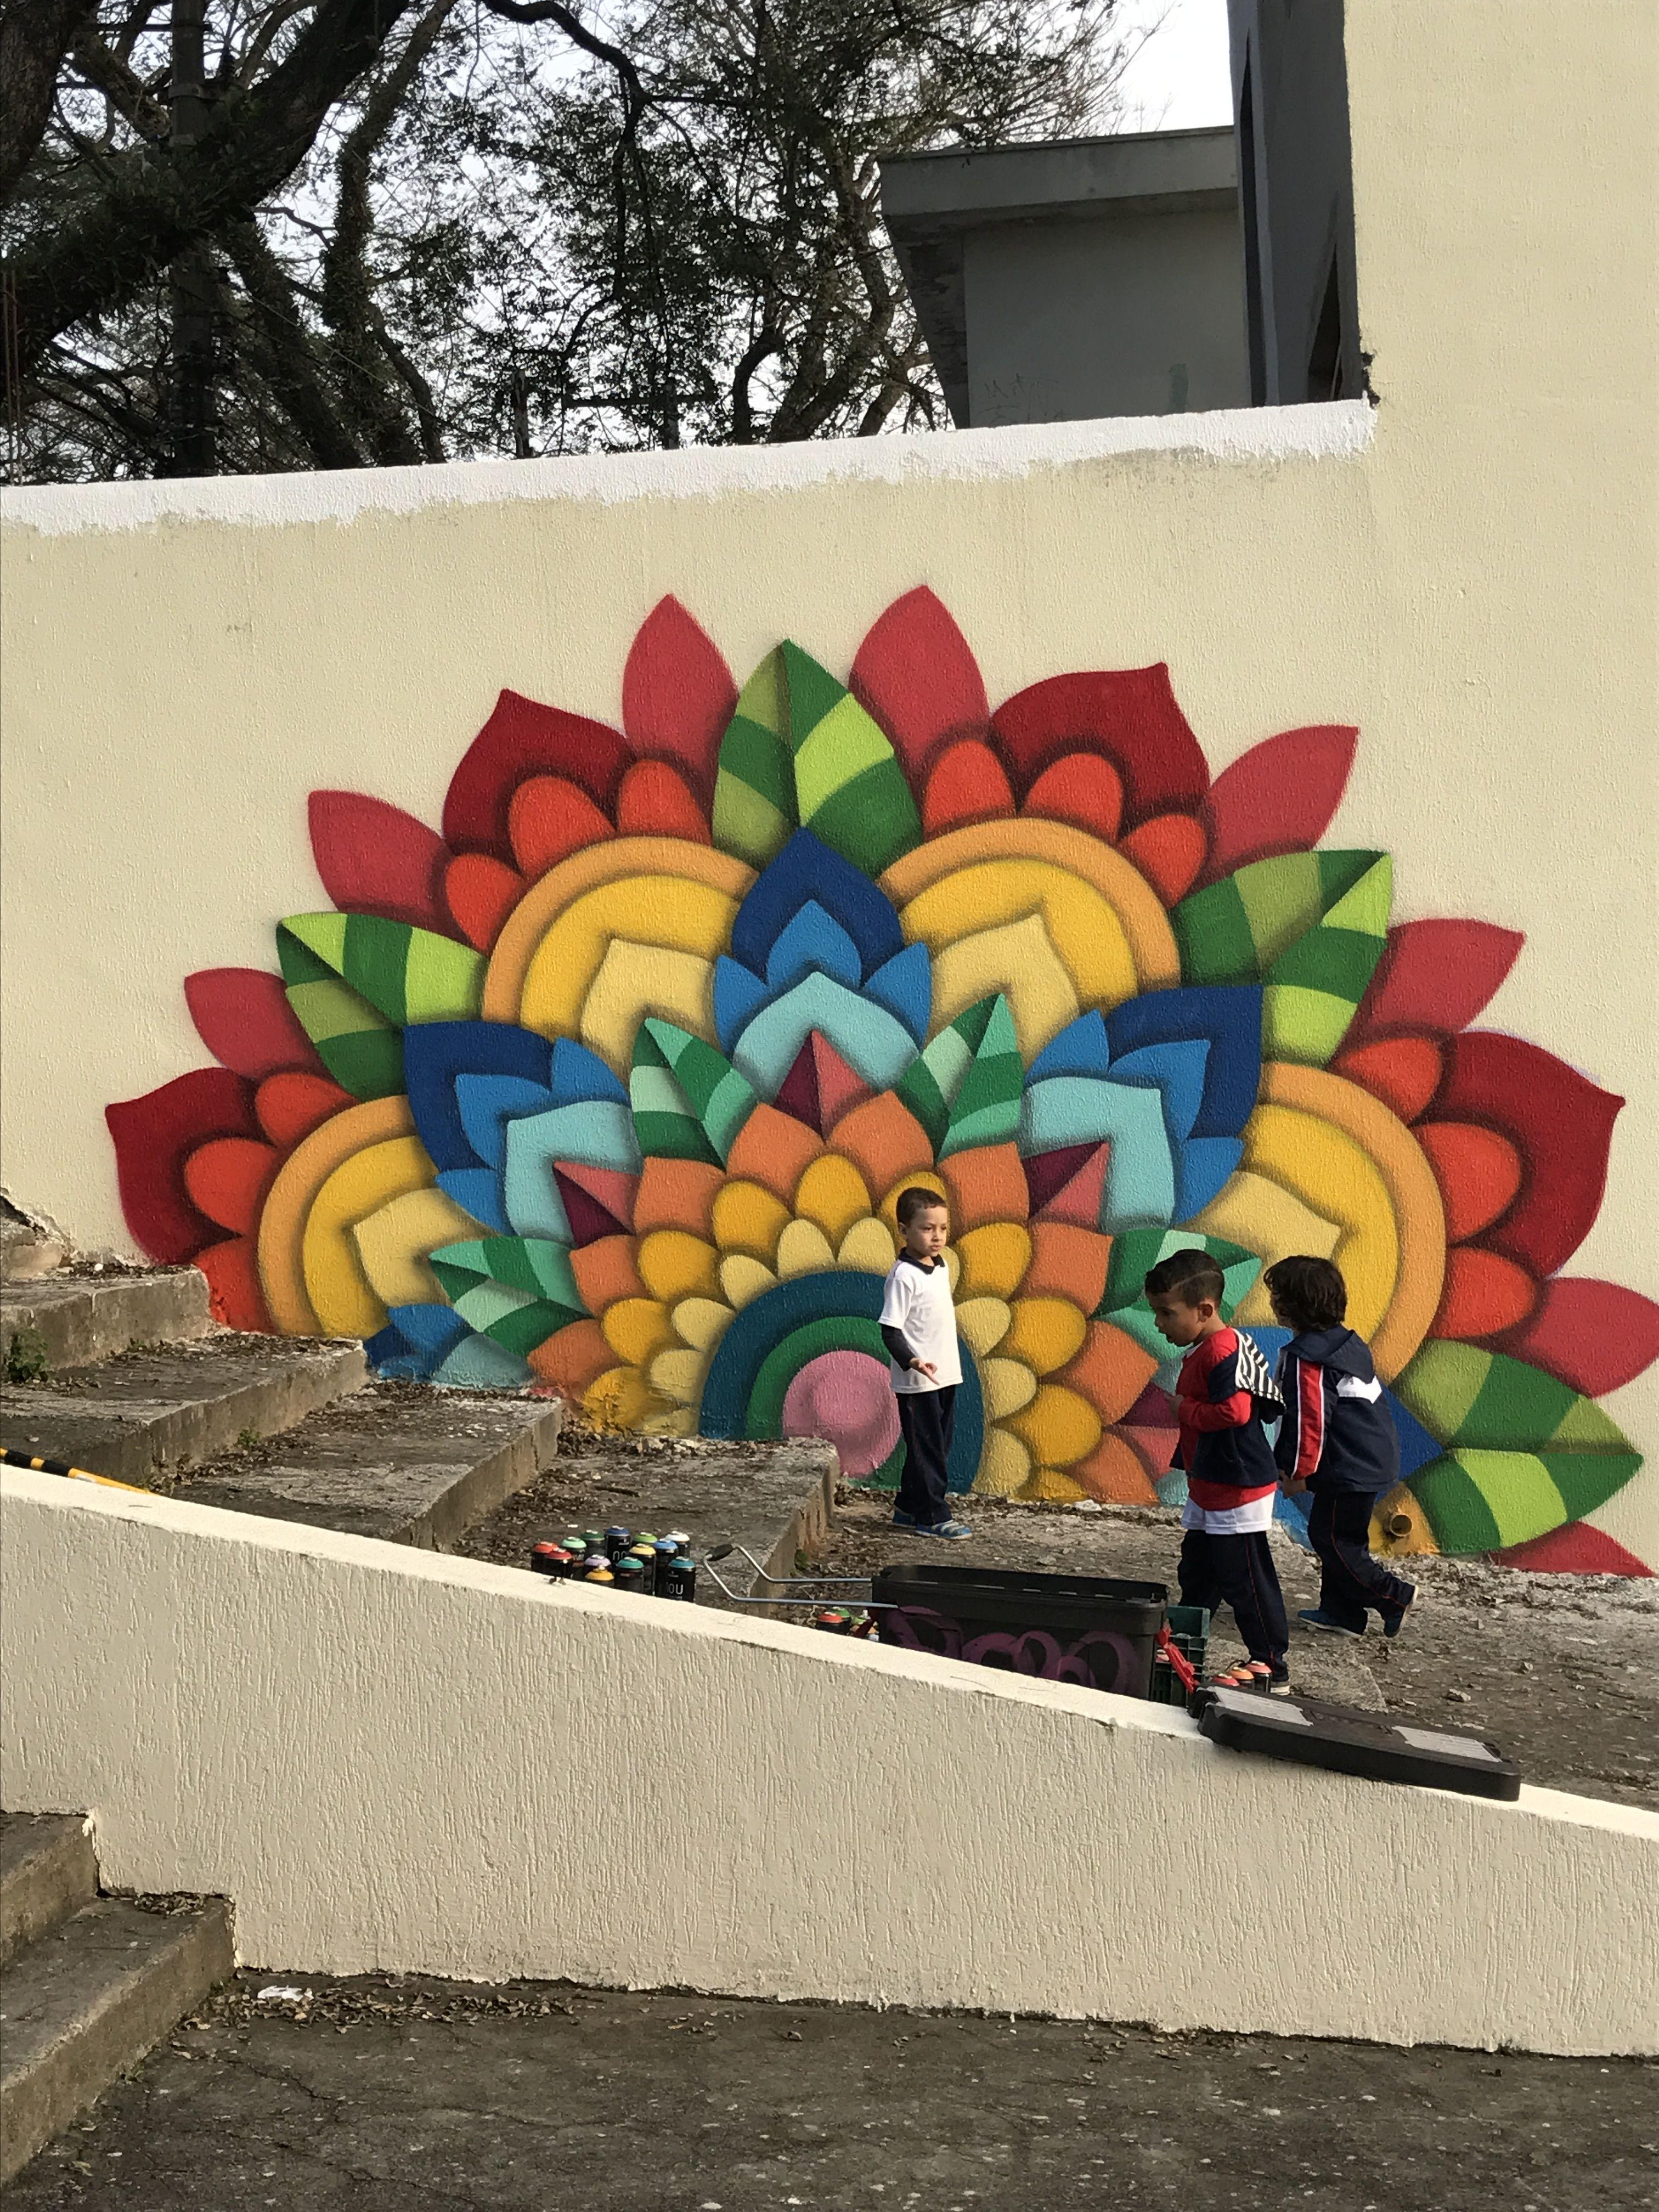 Pin de k ro vlv en mandala en 2019 parement mural - Paredes pintadas originales ...